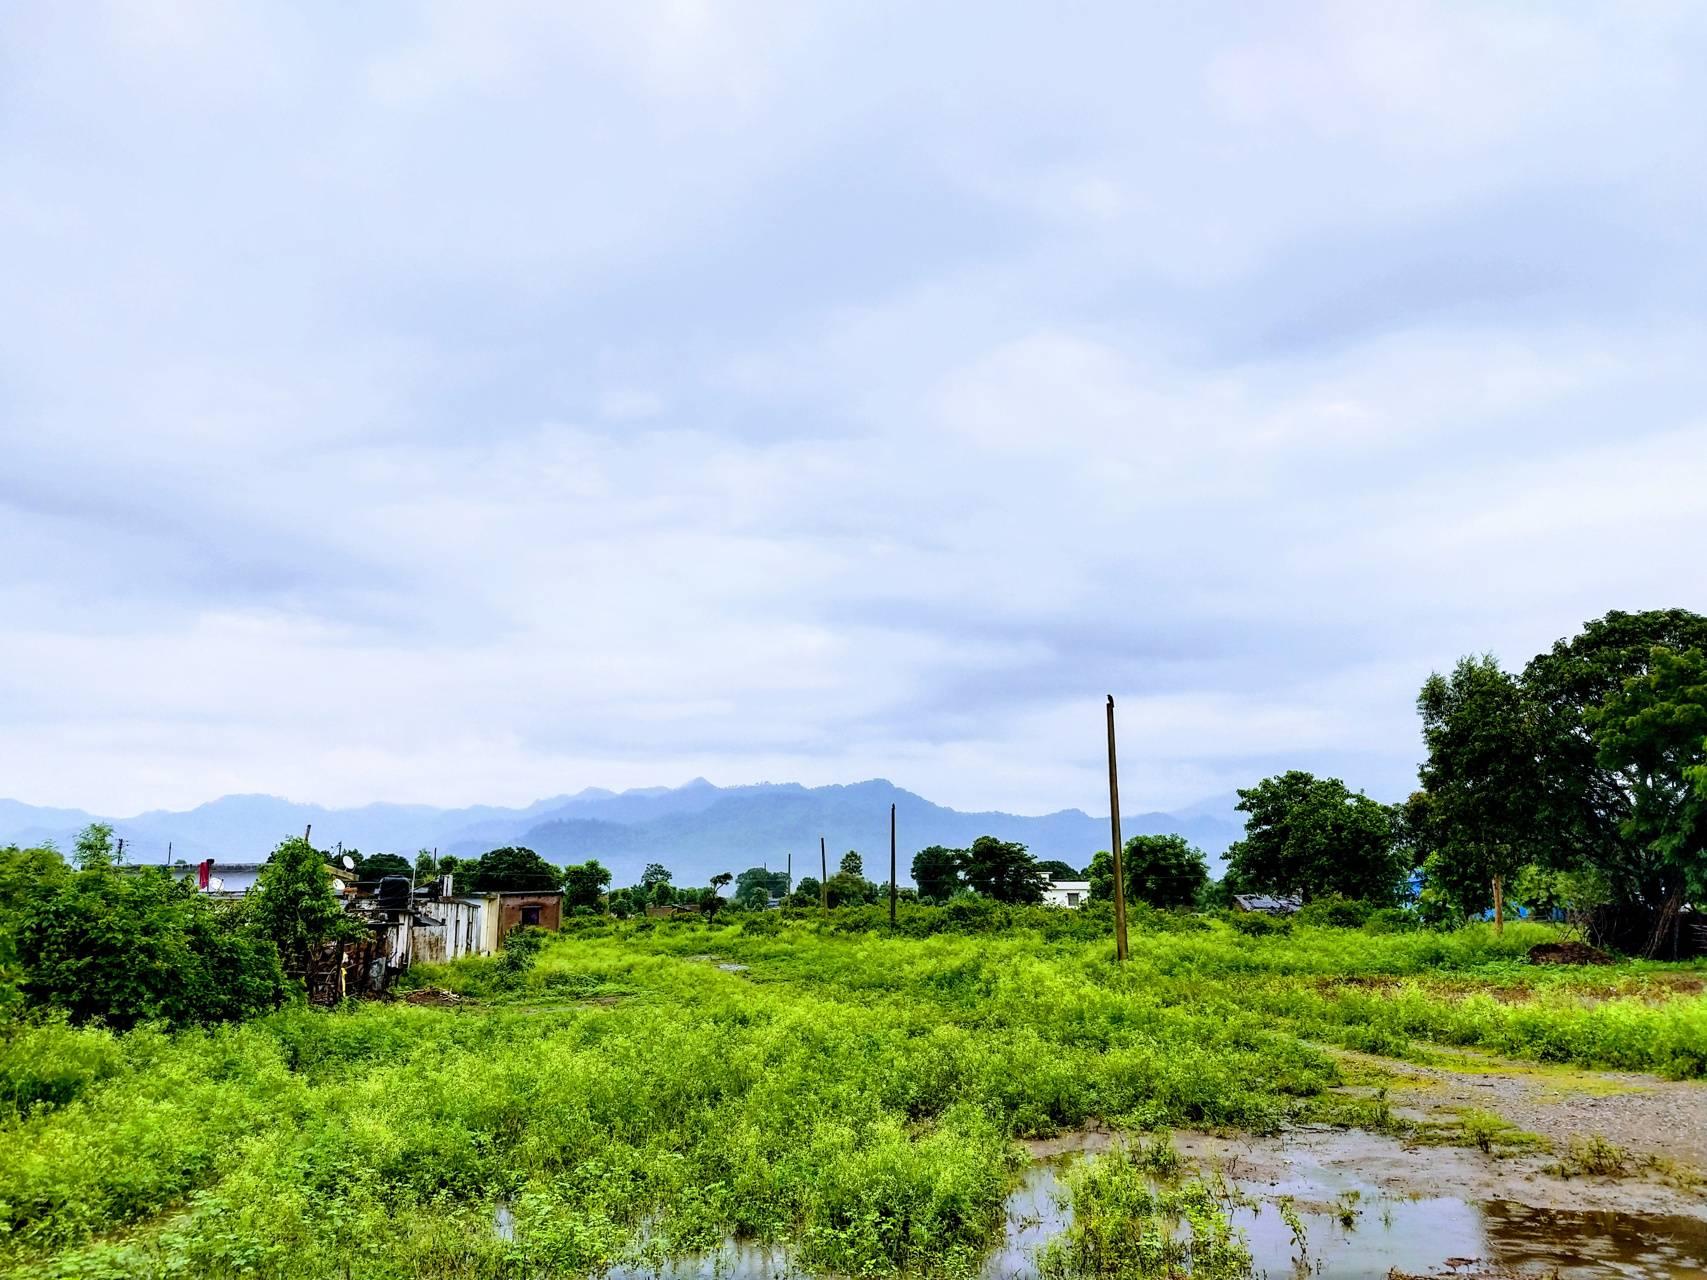 Uttrakhand mountains